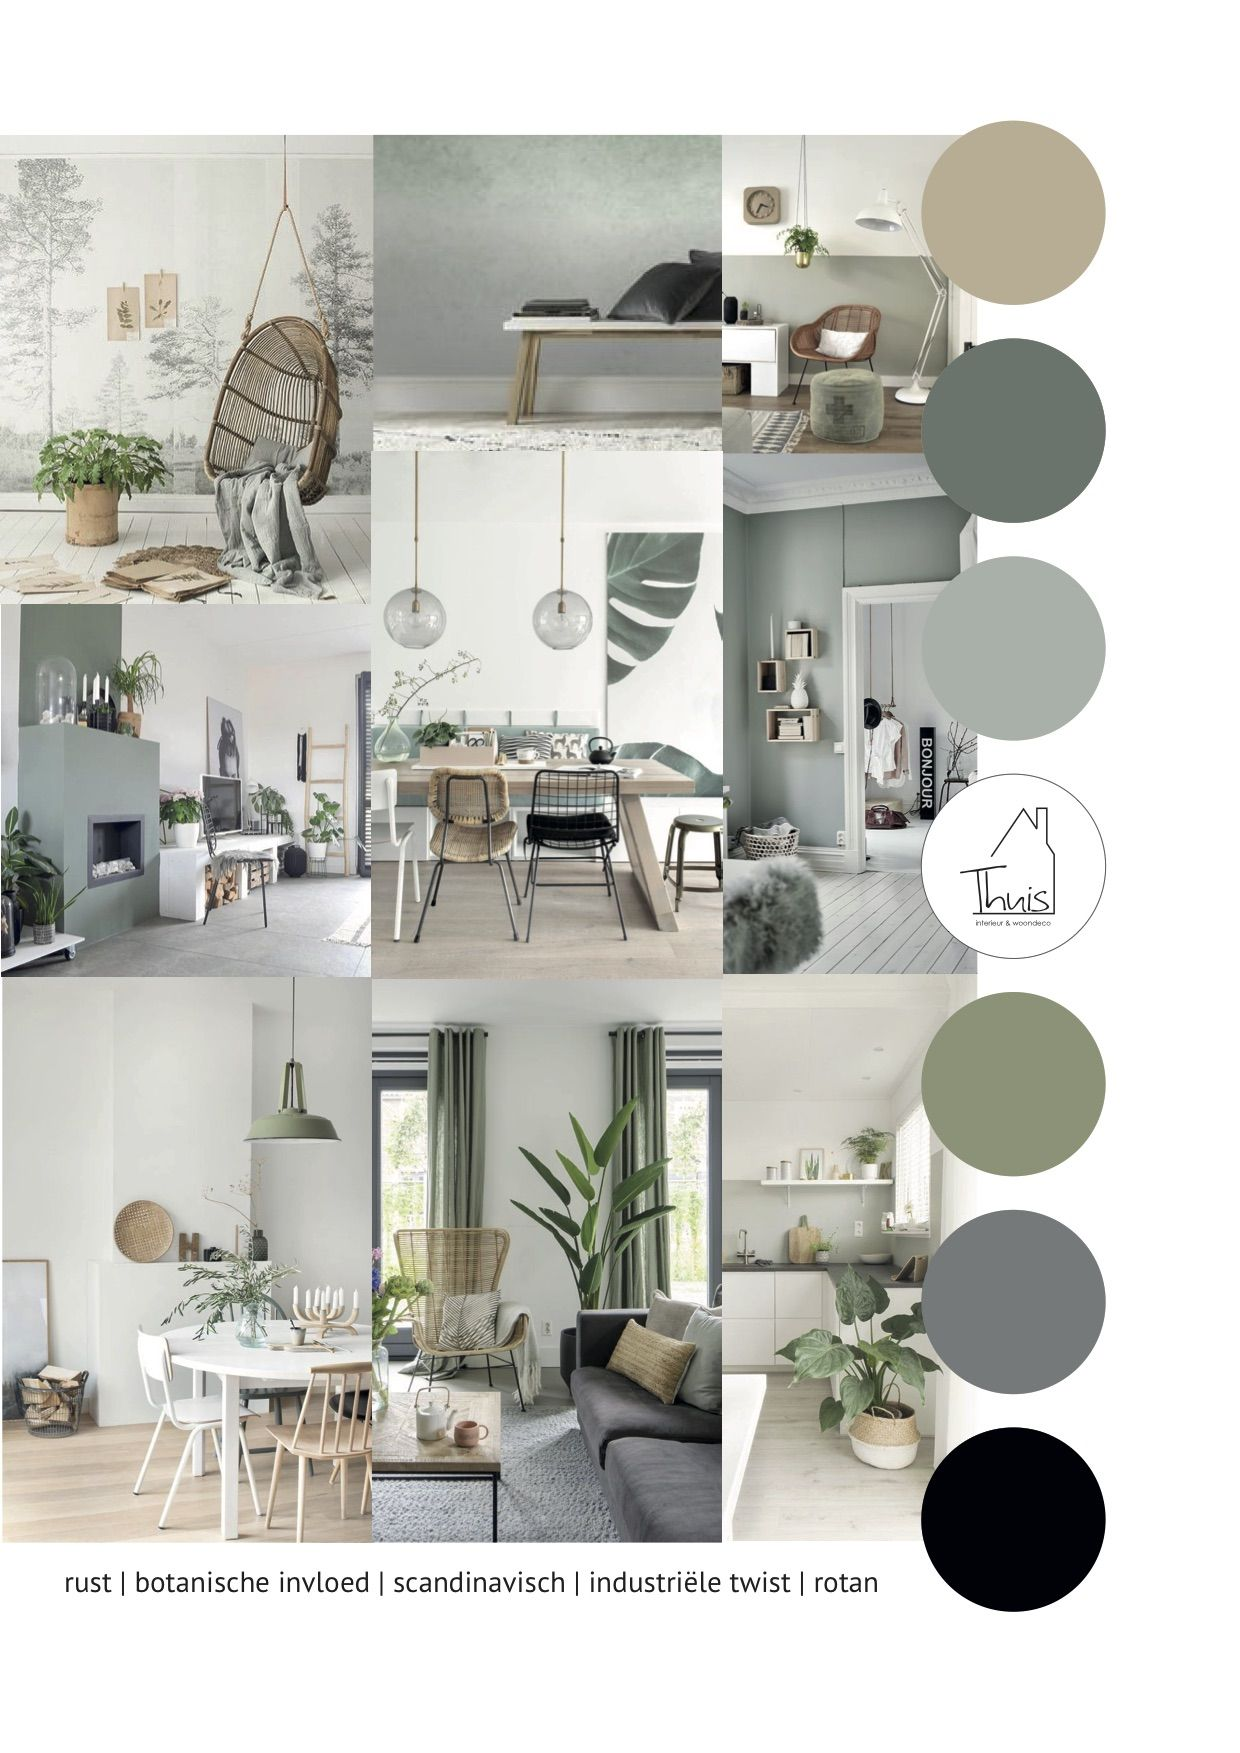 Portfolio 12 Stoere woonkamer - THUIS interieur & woondeco #woonkamerinspiratie